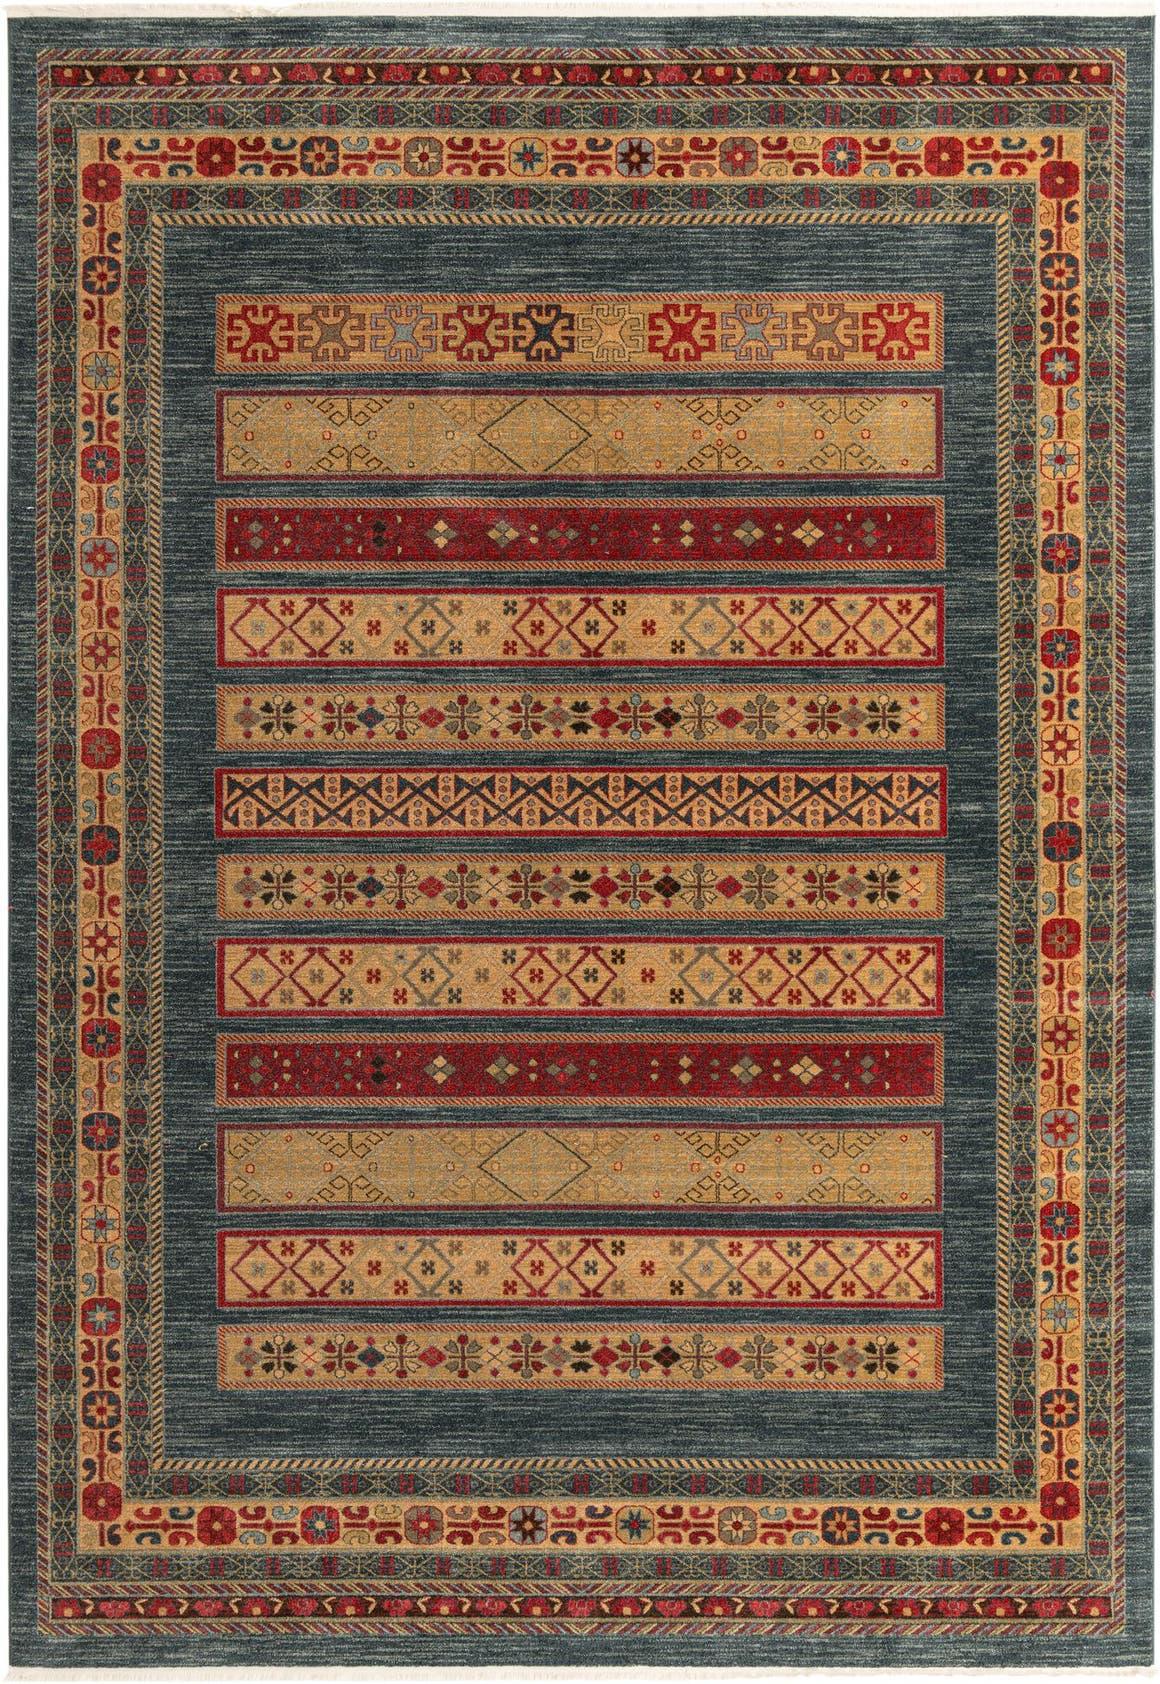 10' x 14' Kashkuli Gabbeh Rug main image